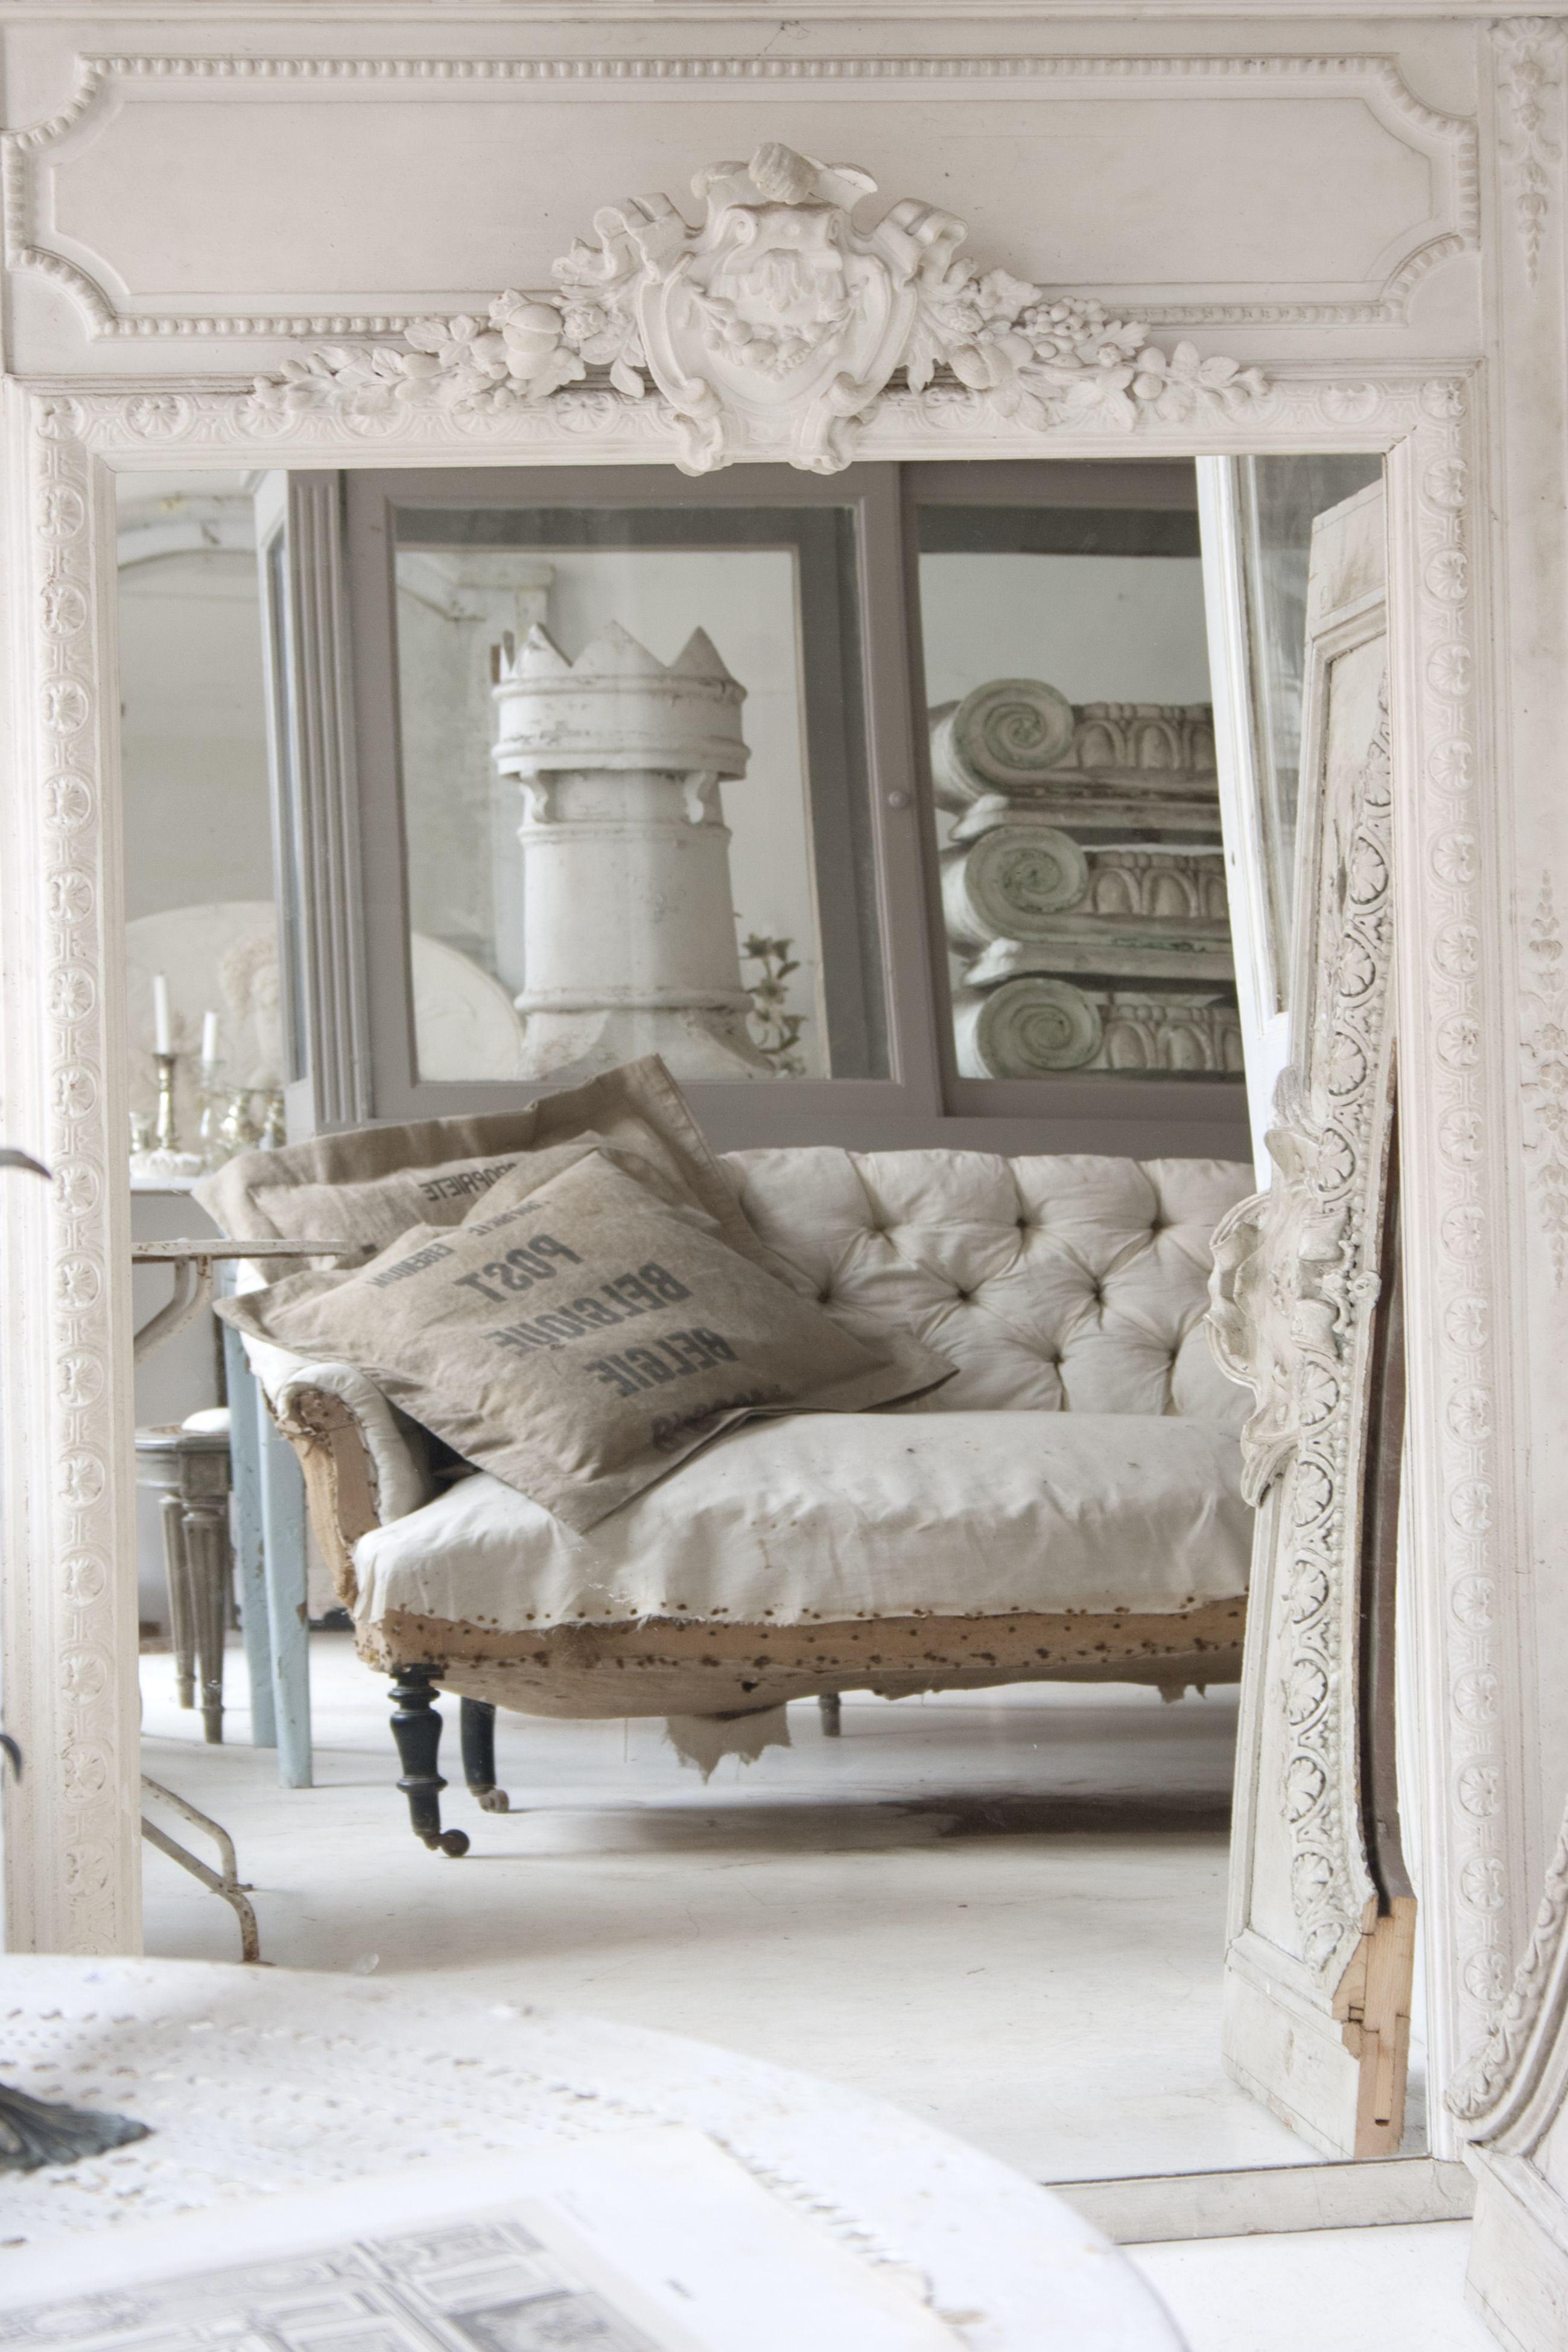 vintagebynina.com · #Vintage #Home #Decor via - Christina Khandan ...